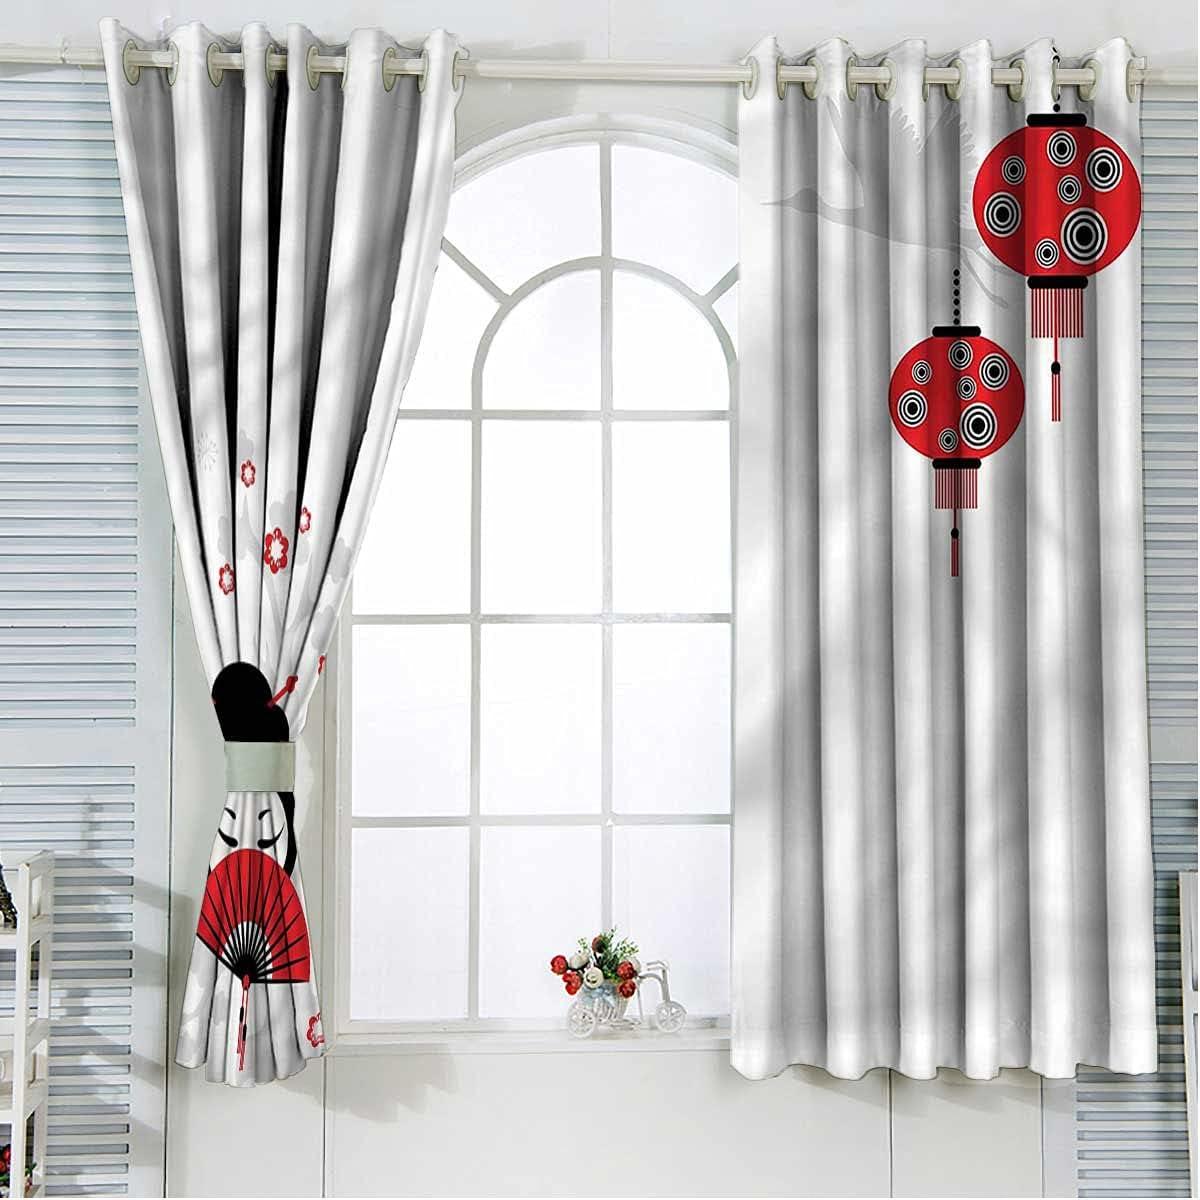 Lantern Curtains Drapes 63 Inch Woman Geisha Japanese C Max 83% OFF store Length